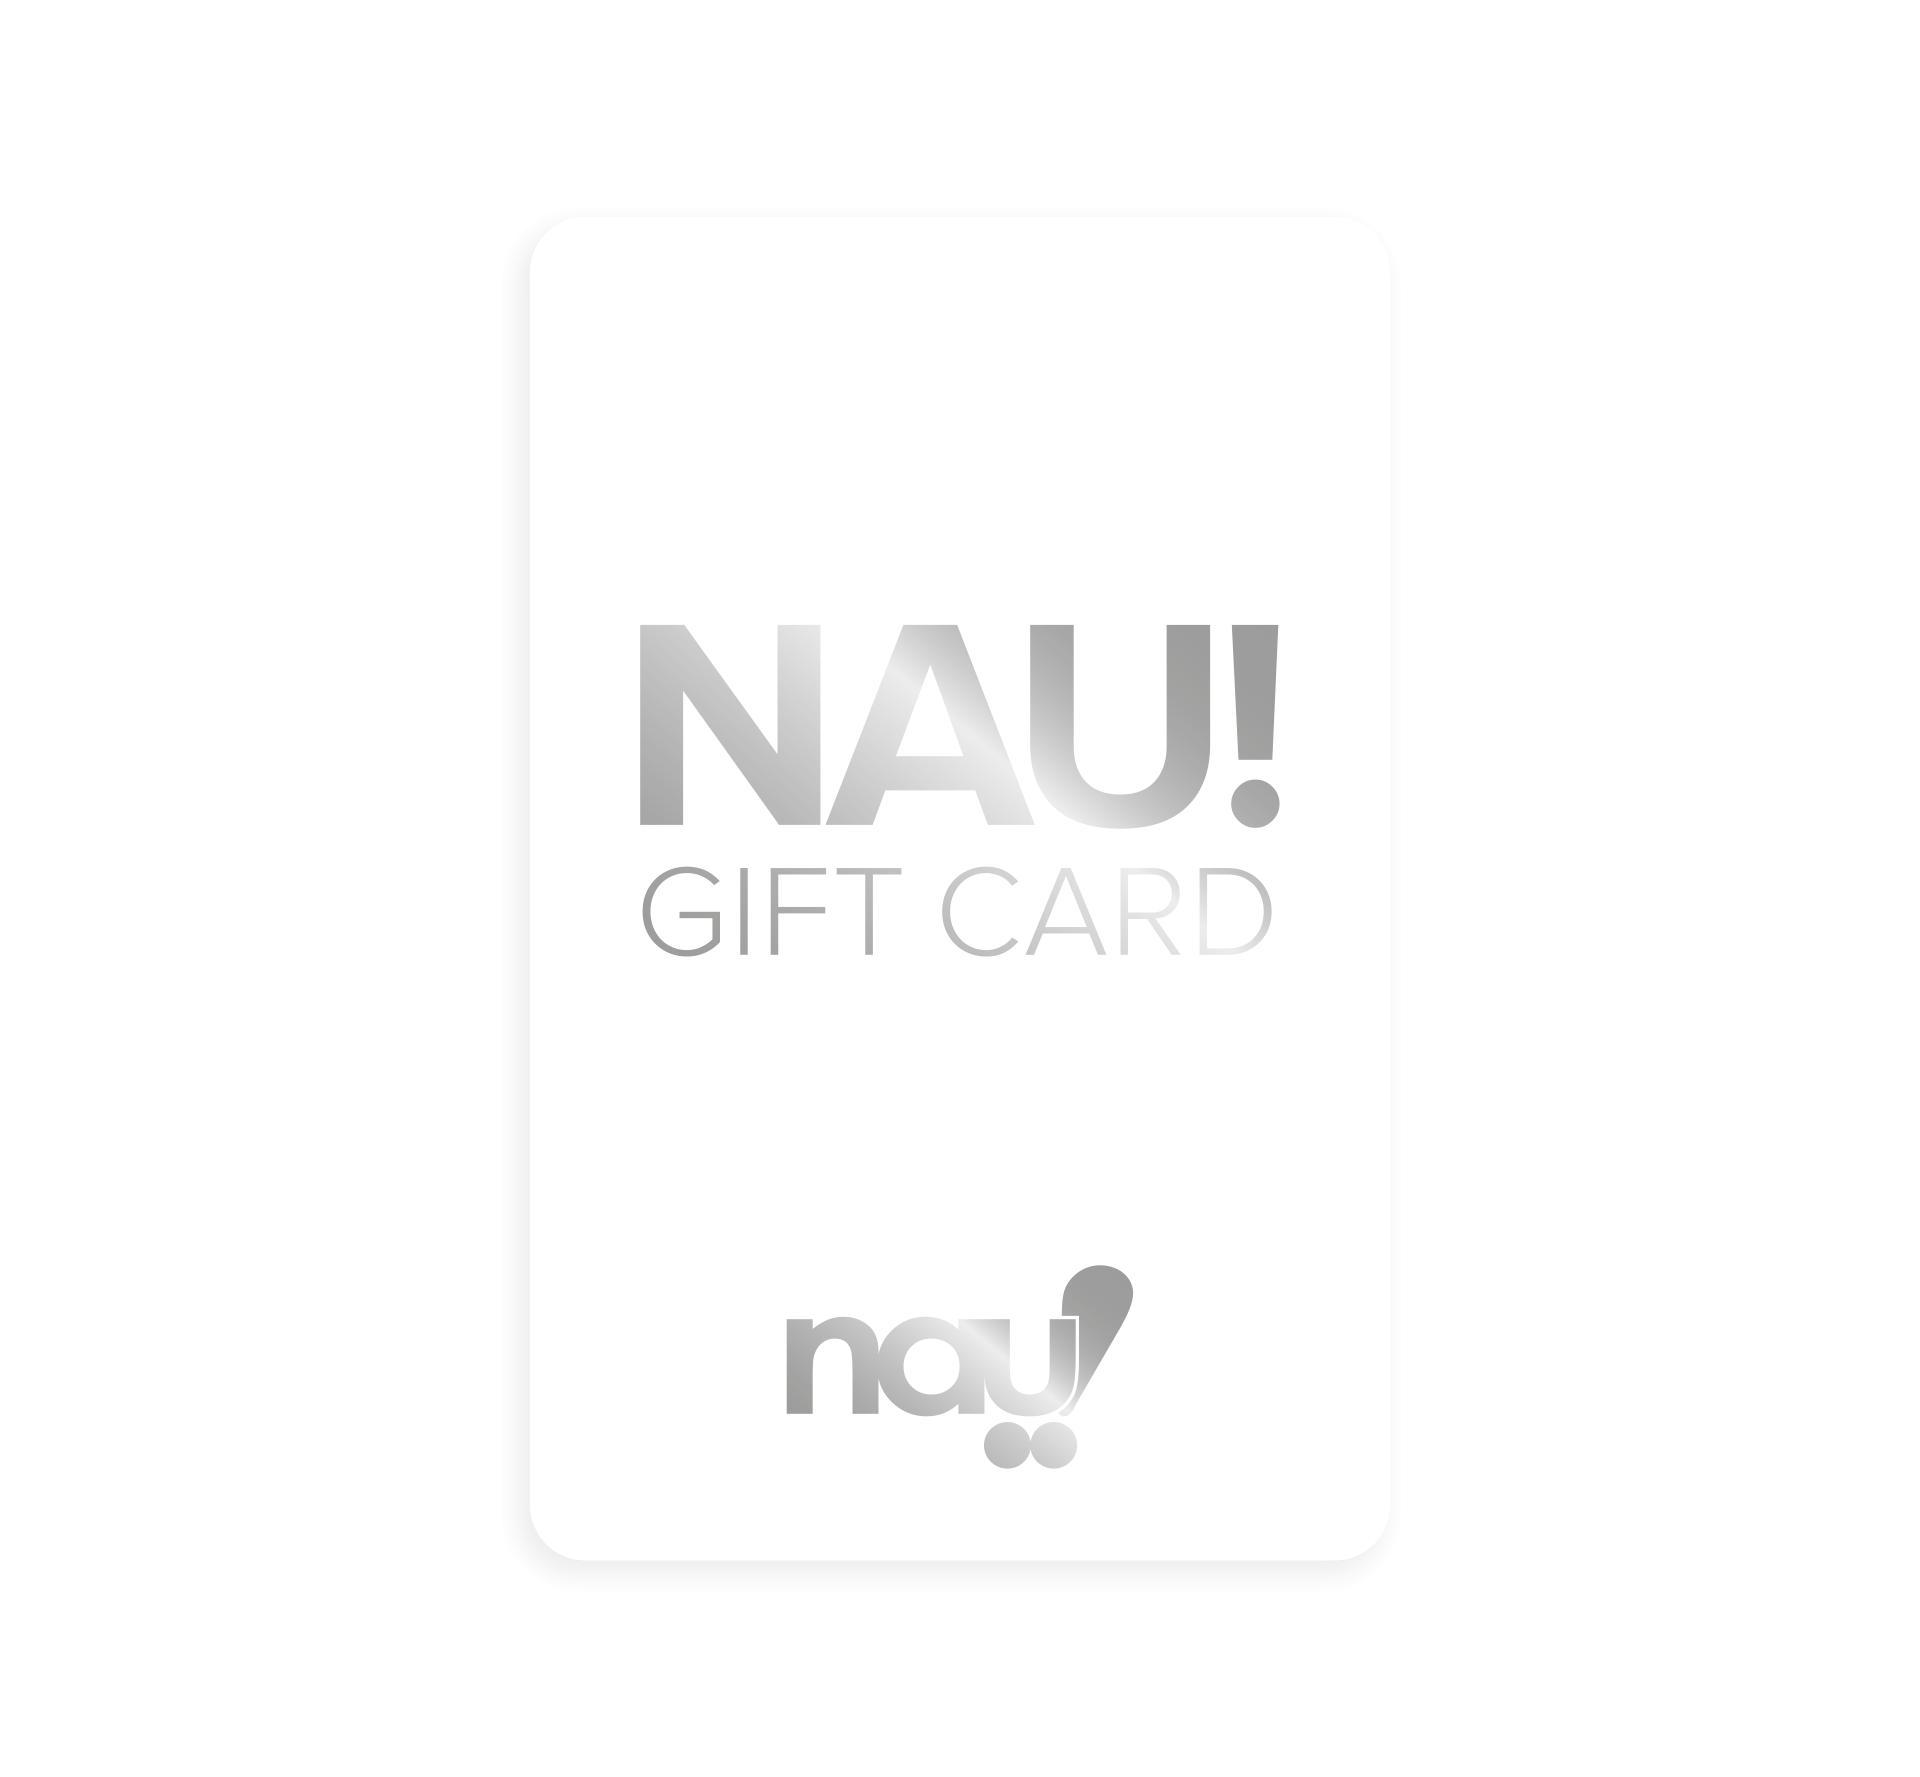 Gift card virtuale